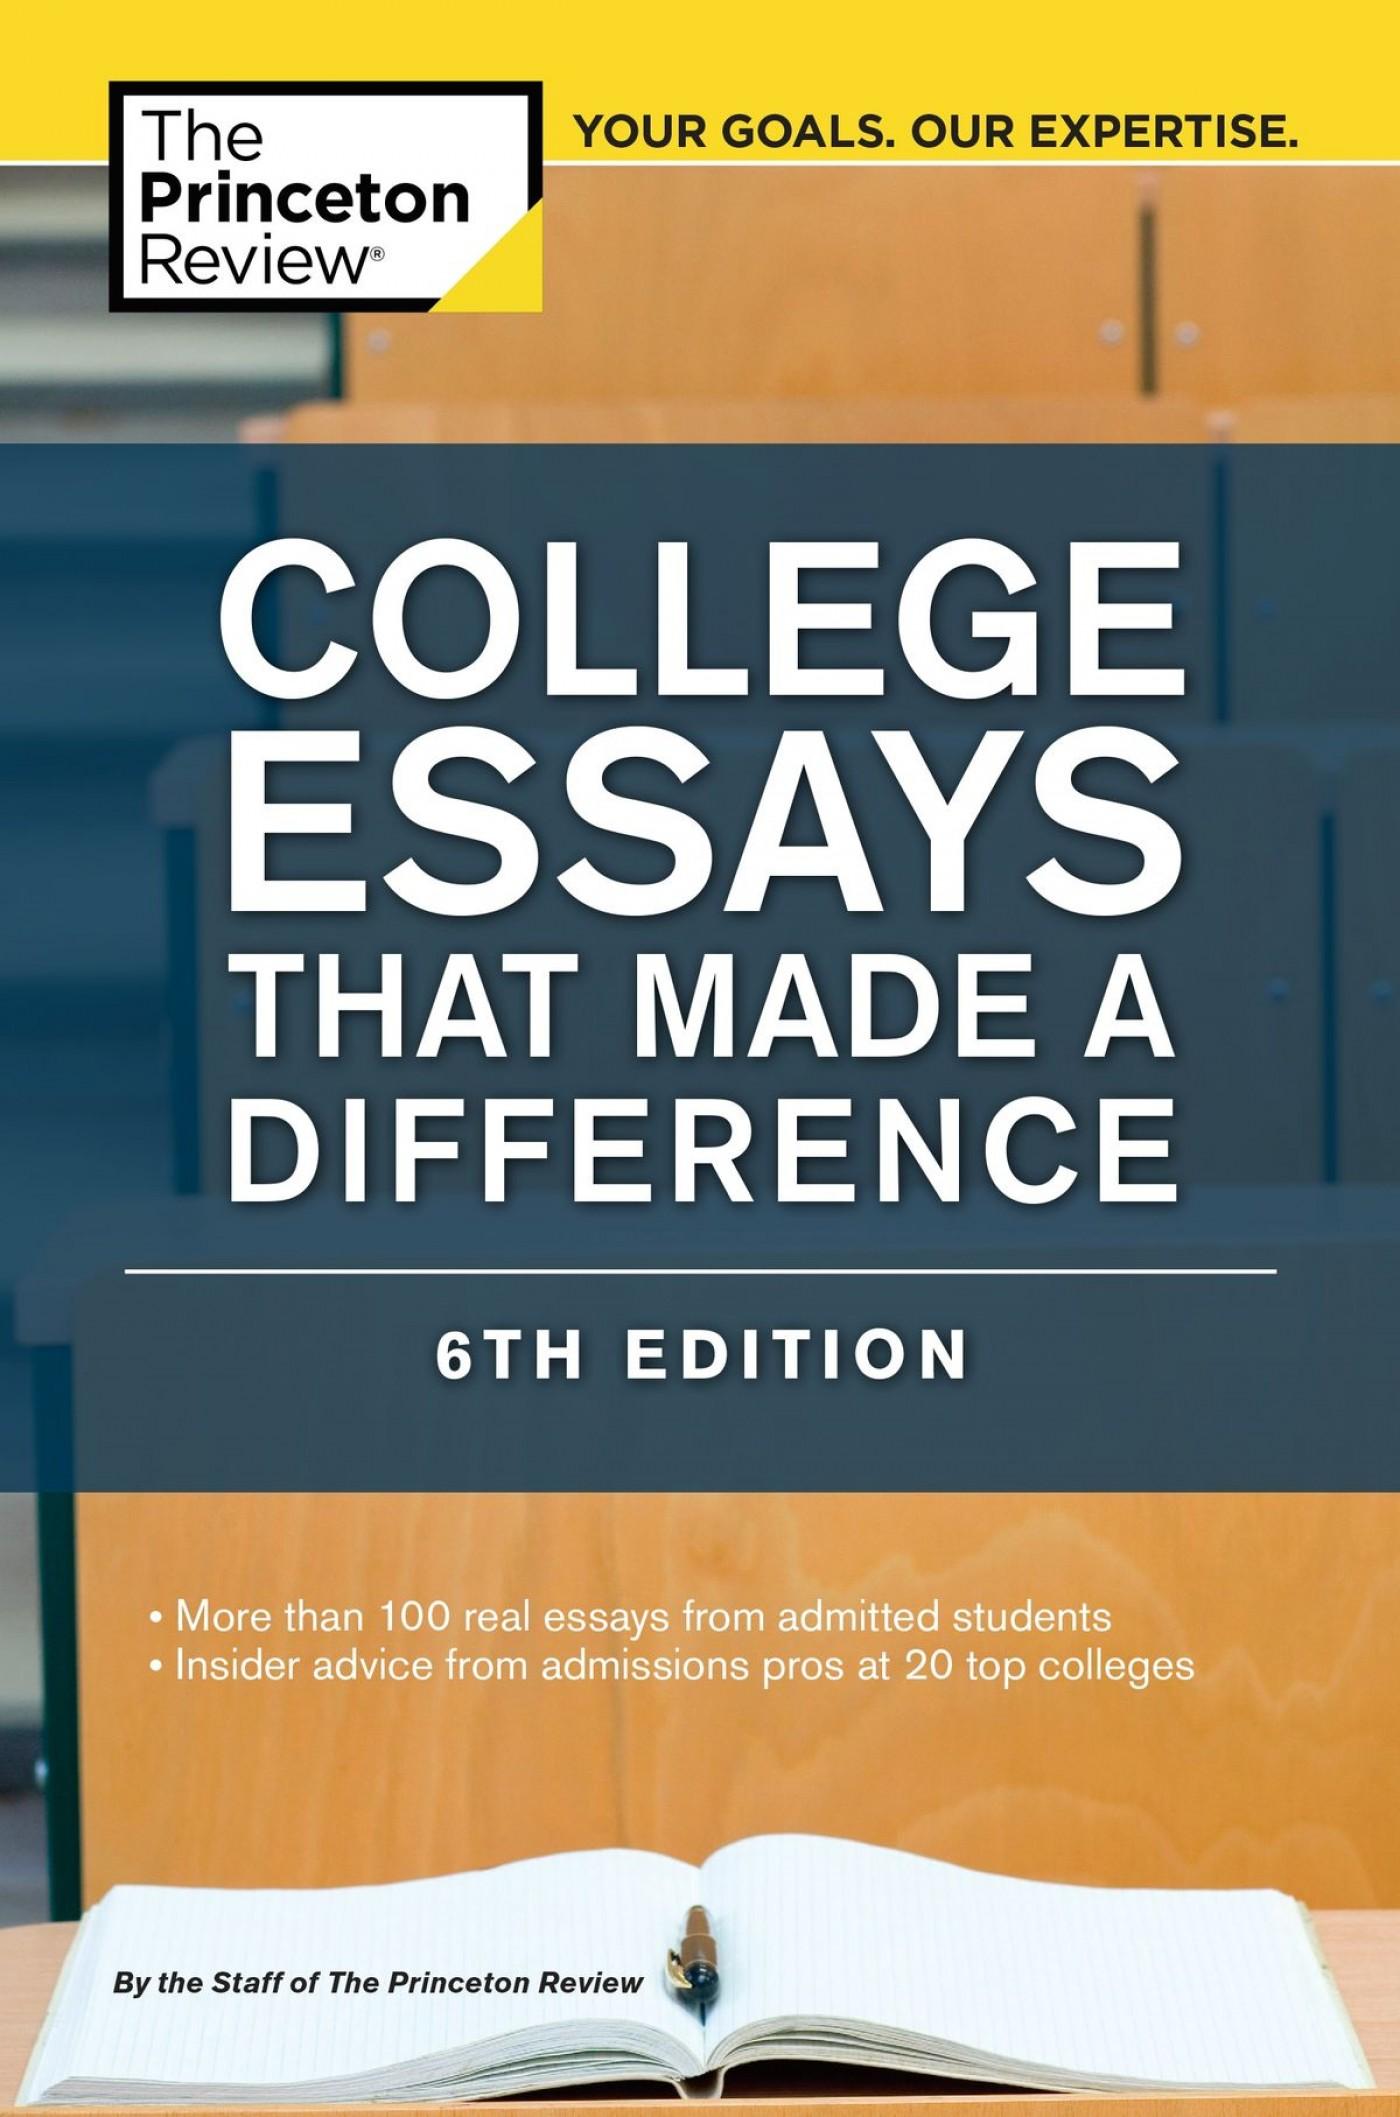 Invention of 20th century essay